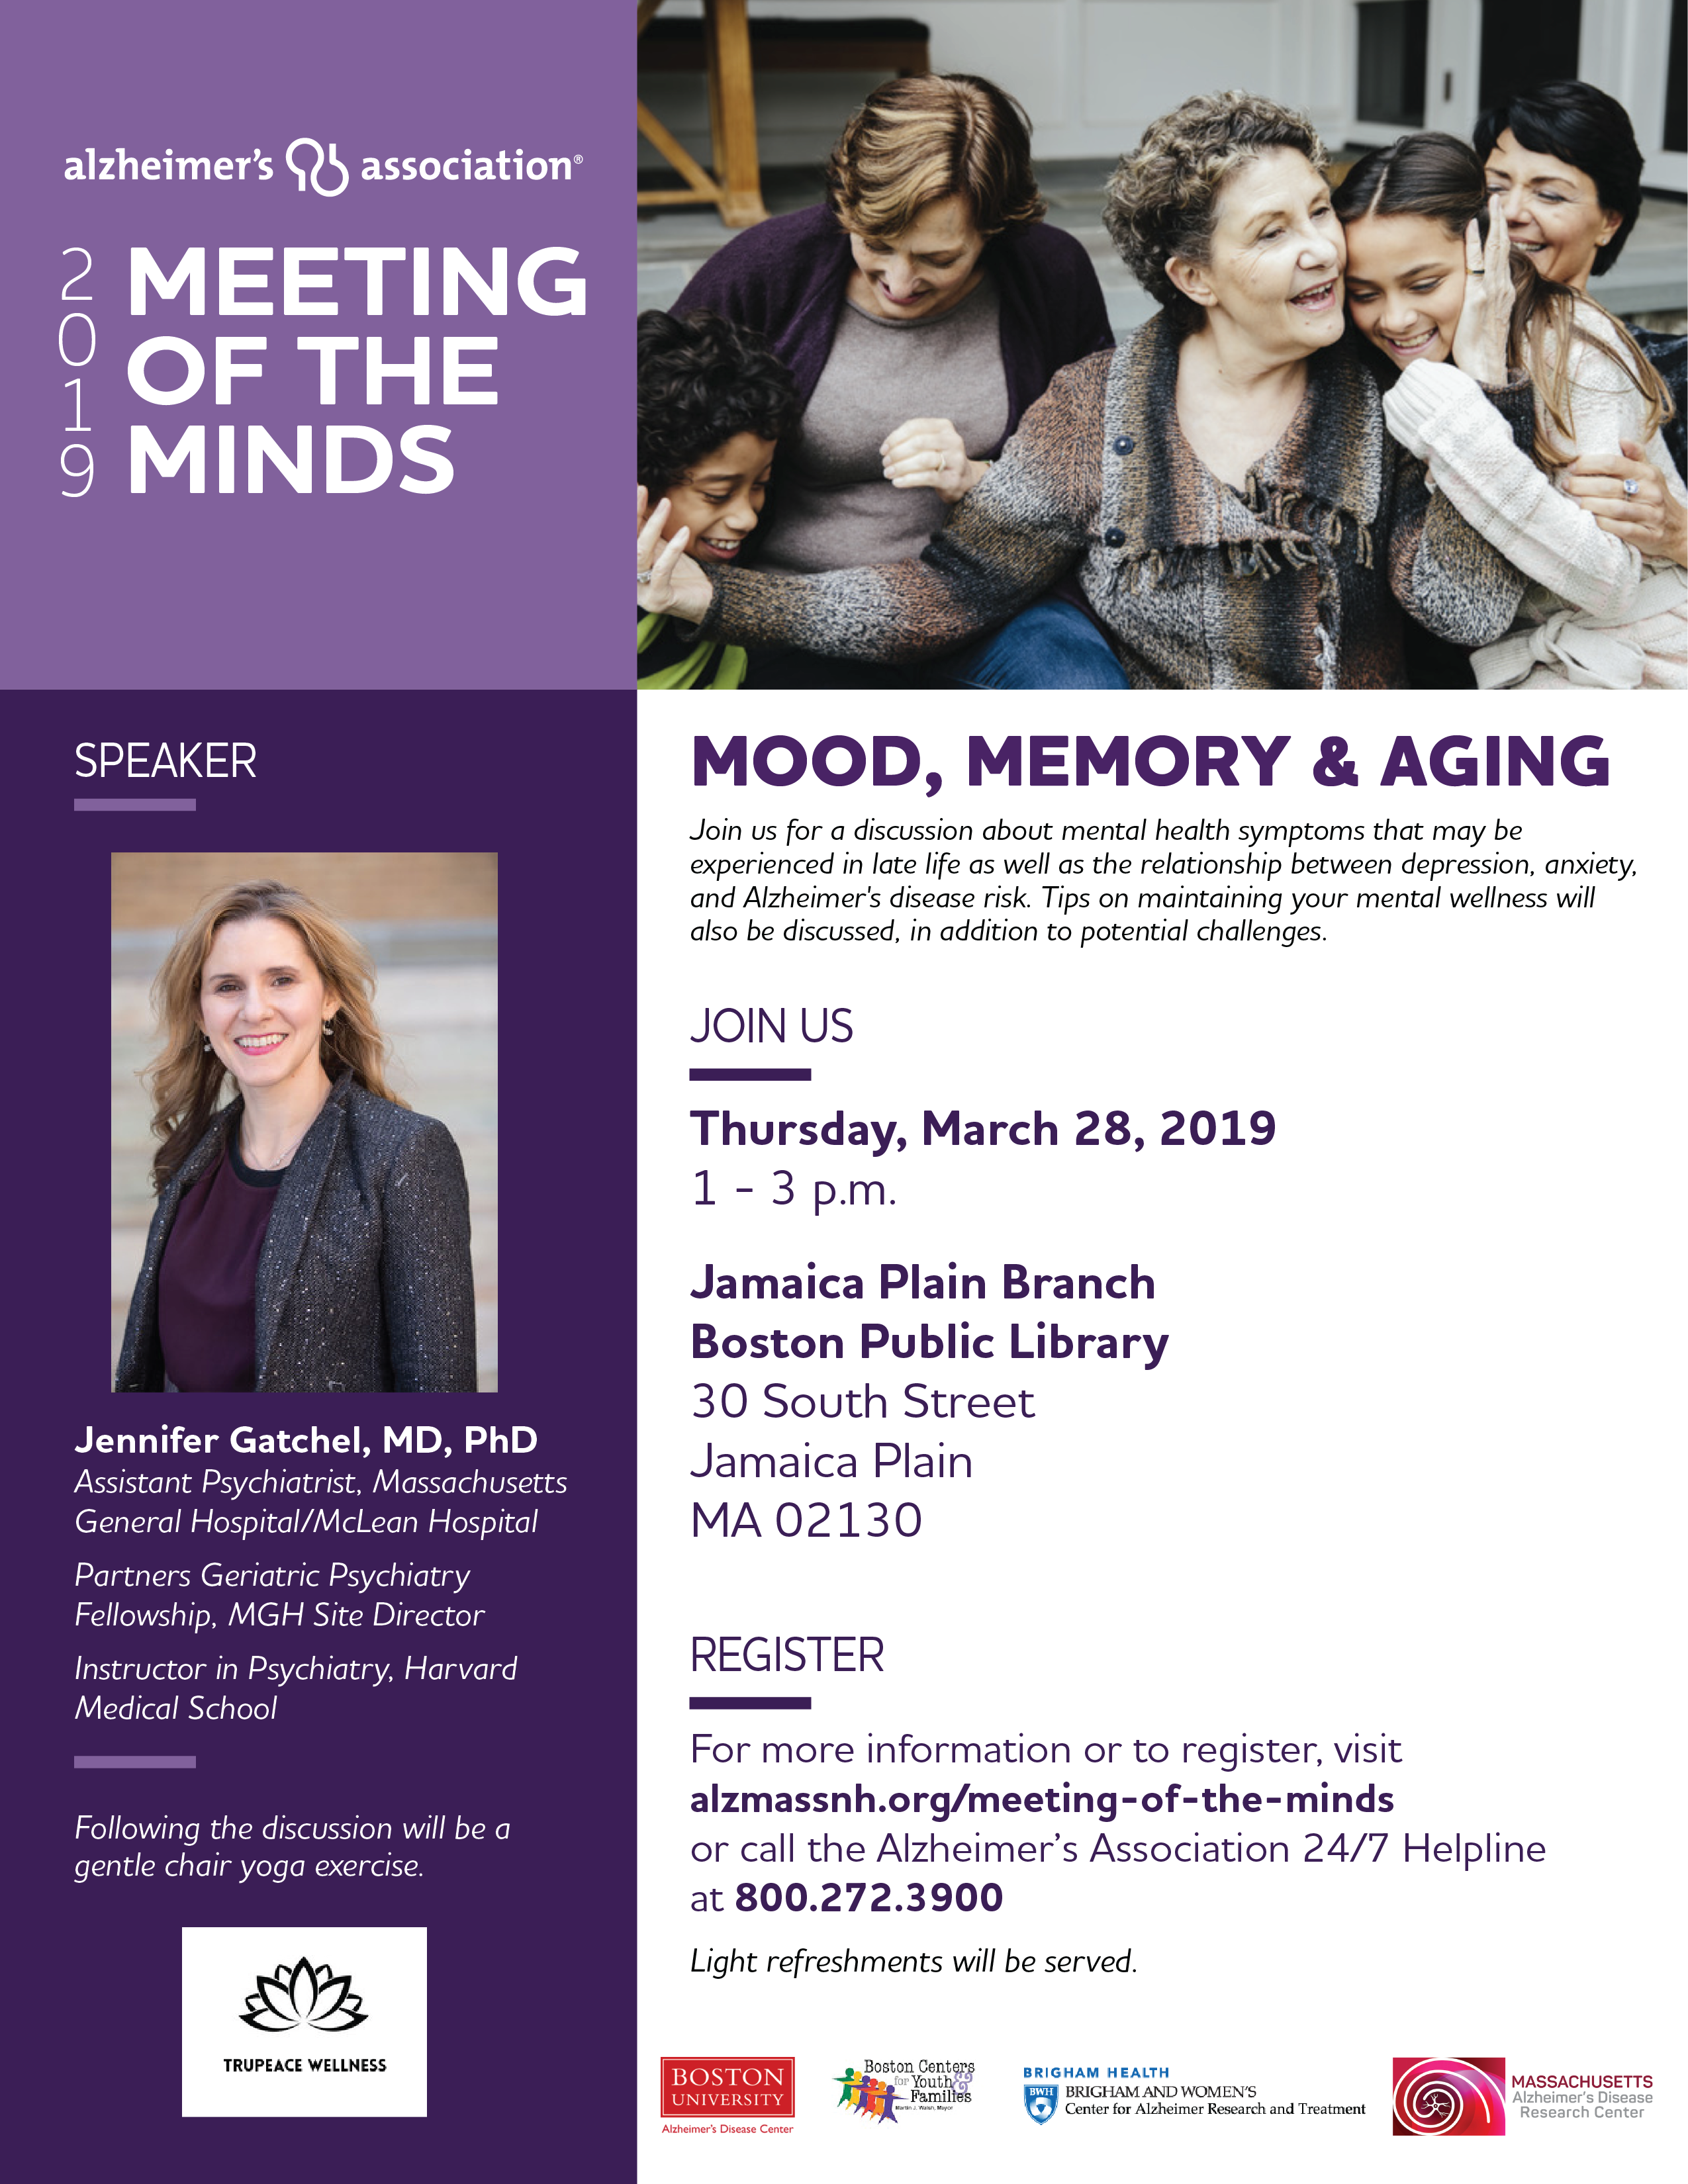 Alzheimer's Association Meeting of the Minds: Mood, Memory